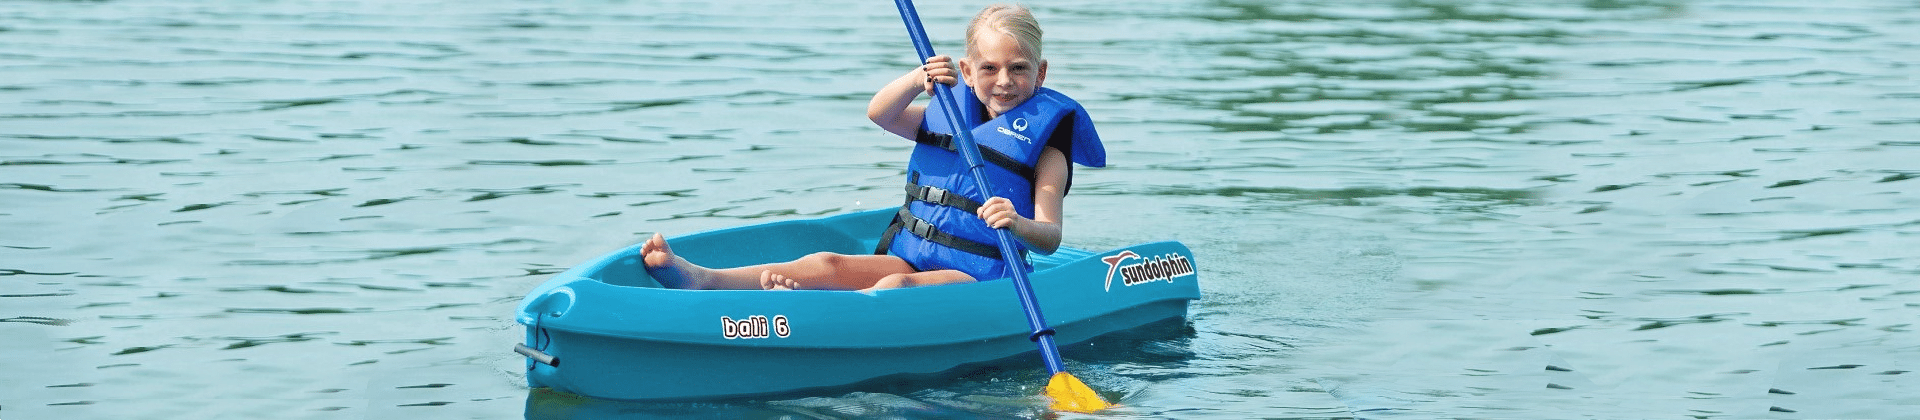 Best Kayaks for Kids Reviewed in Detail